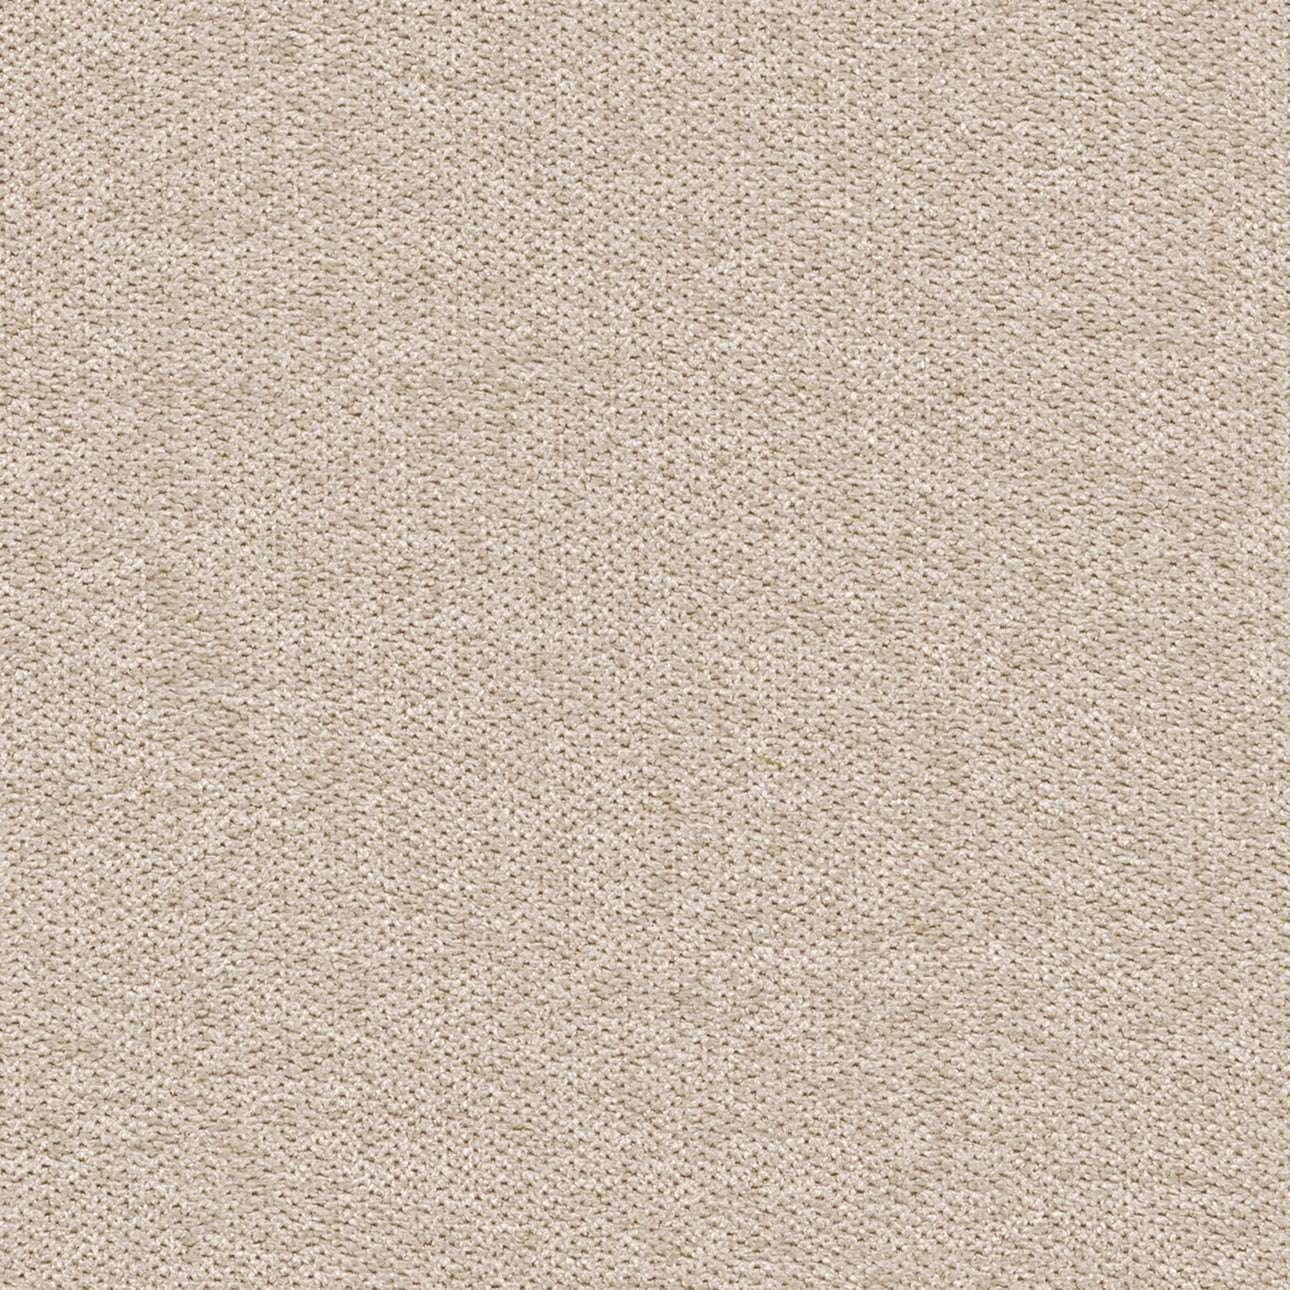 Stolehynde Jacob fra kollektionen Etna, Stof: 705-02